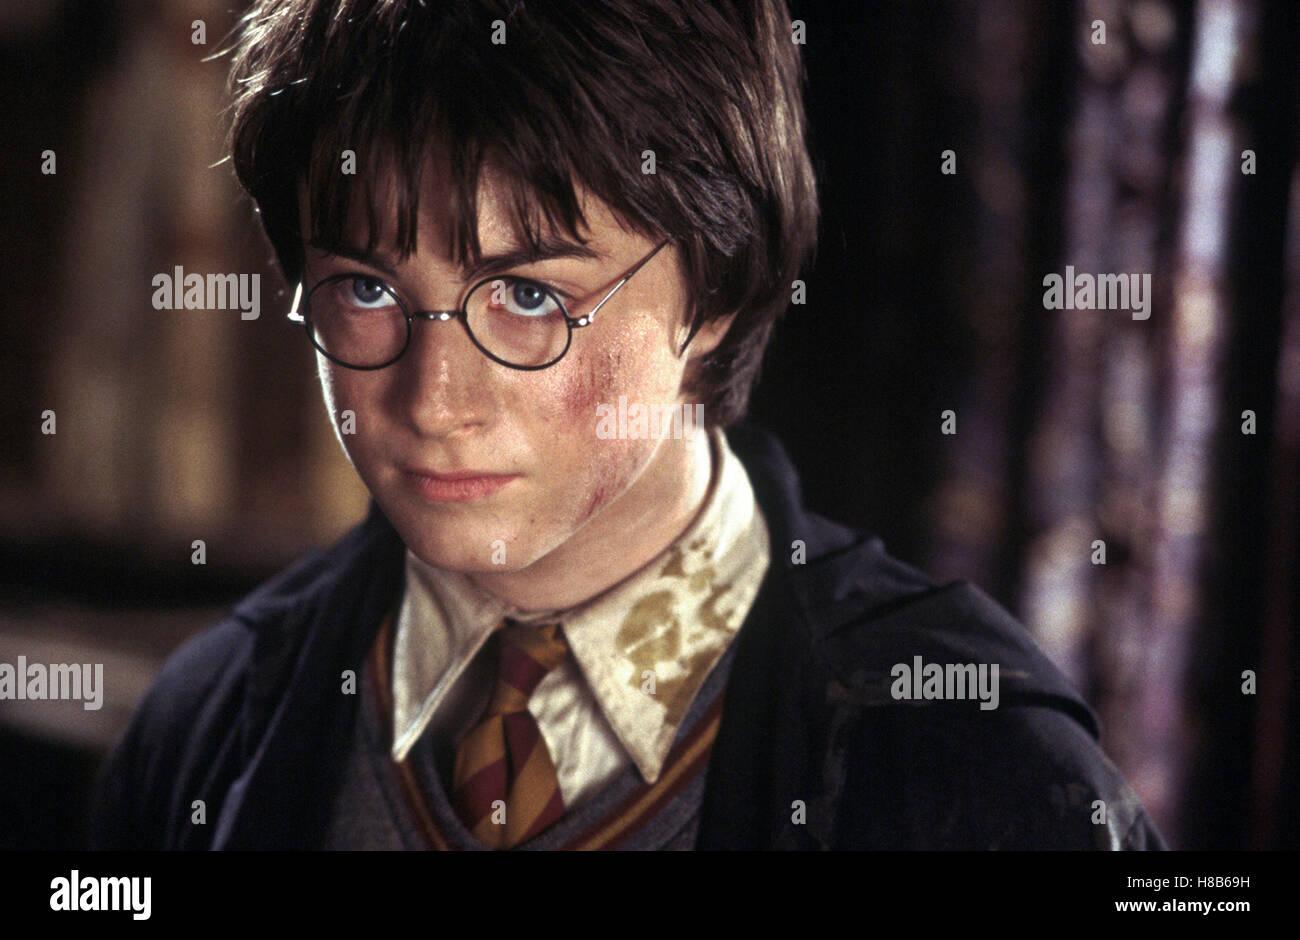 Harry Potter und die Kammer des Schreckens, (HARRY POTTER AND THE CHAMBER OF SECRETS) USA 2002, Regie: Chris Columbus, - Stock Image